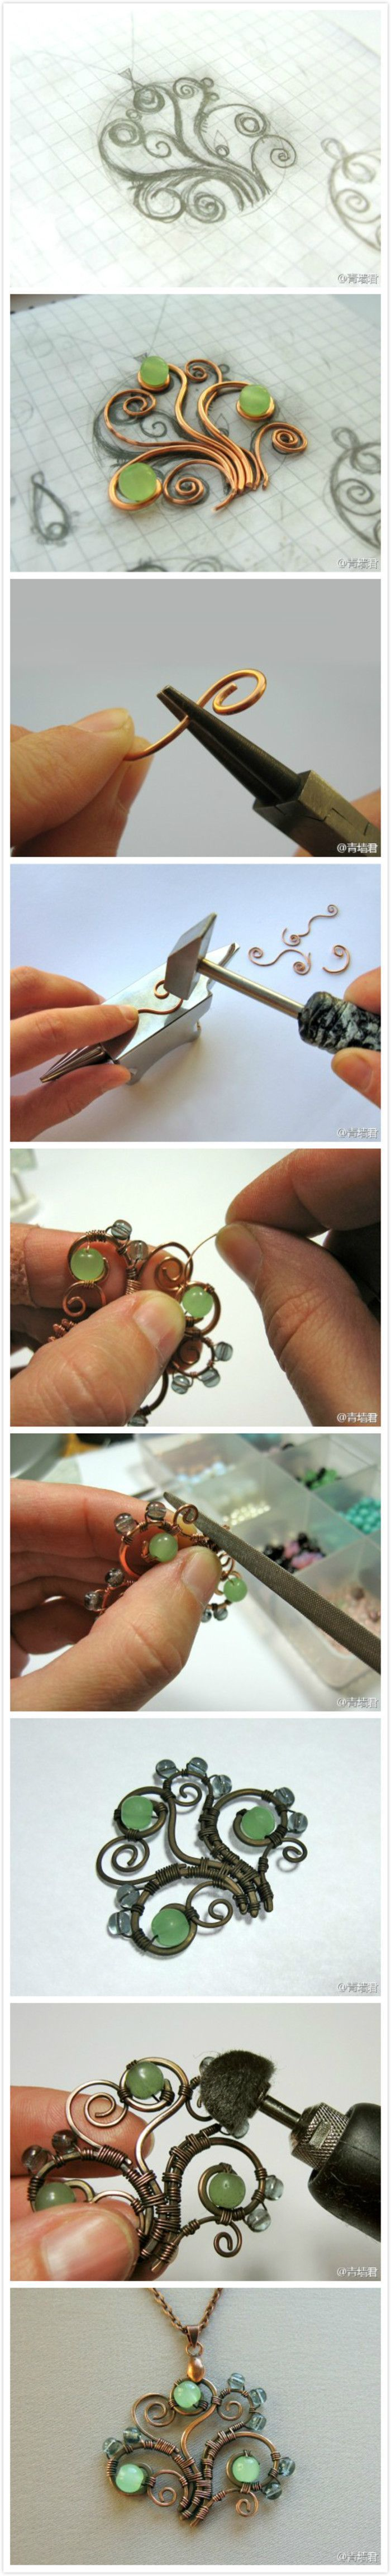 Tutorial DIY Wire Jewelry Image Description